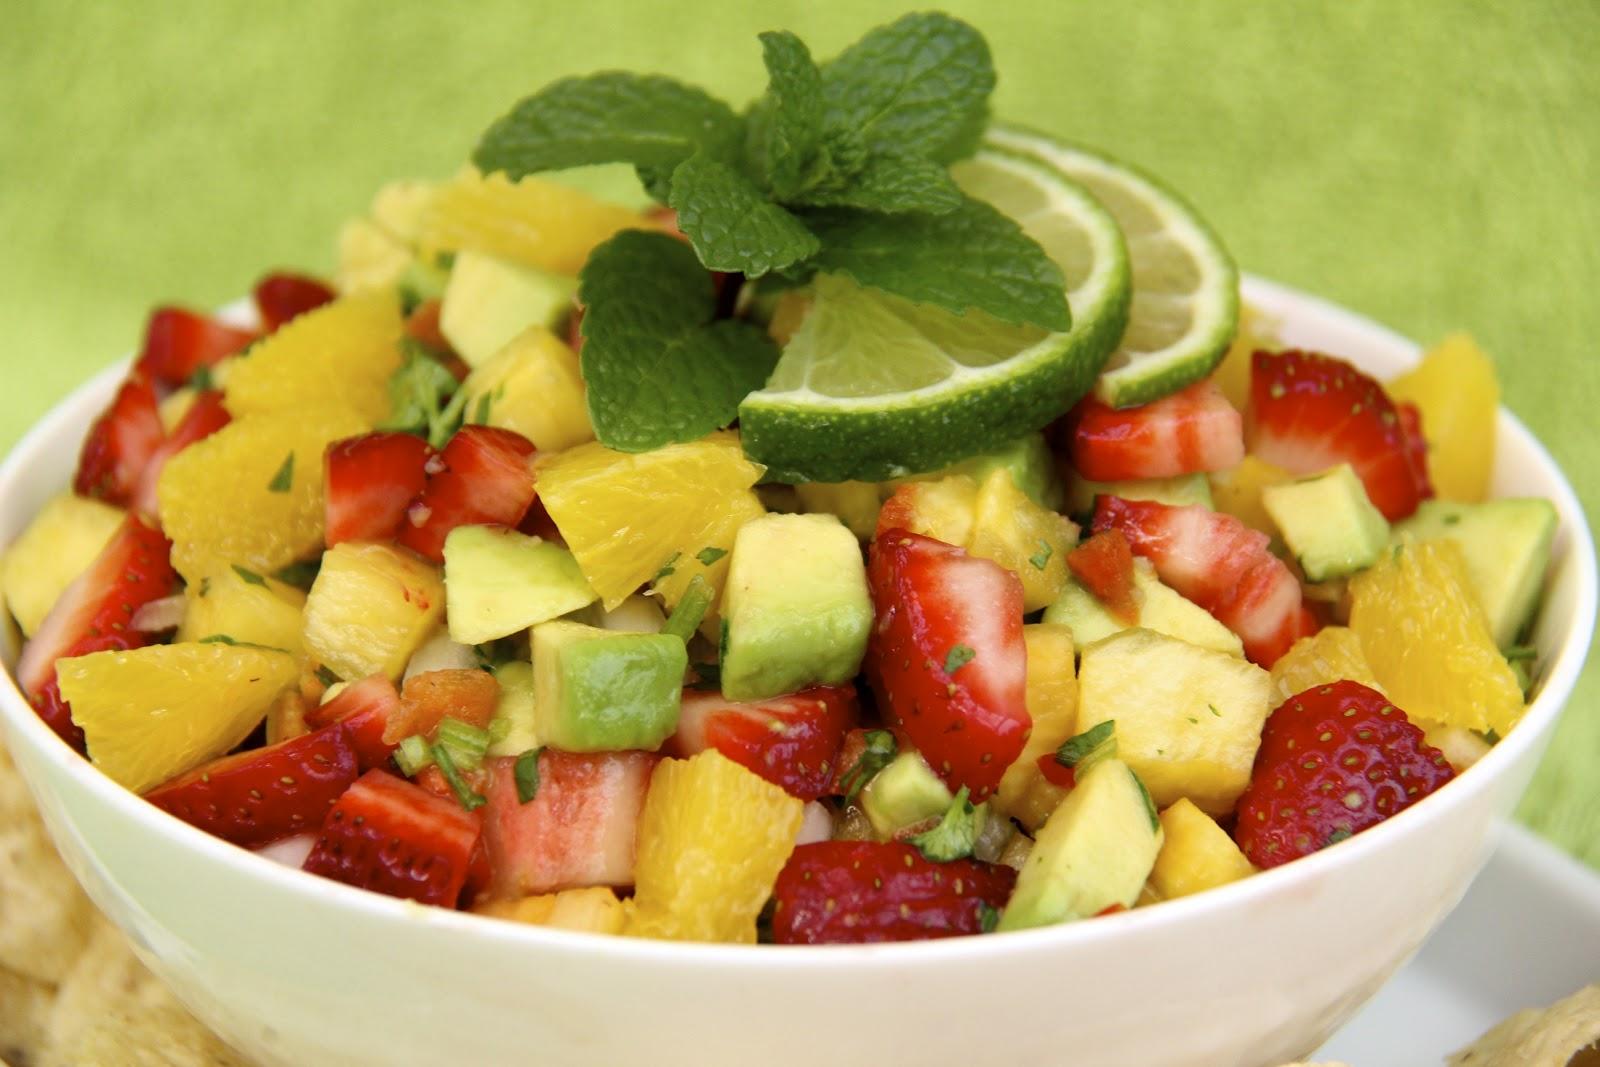 Strawberries, citrus fruits